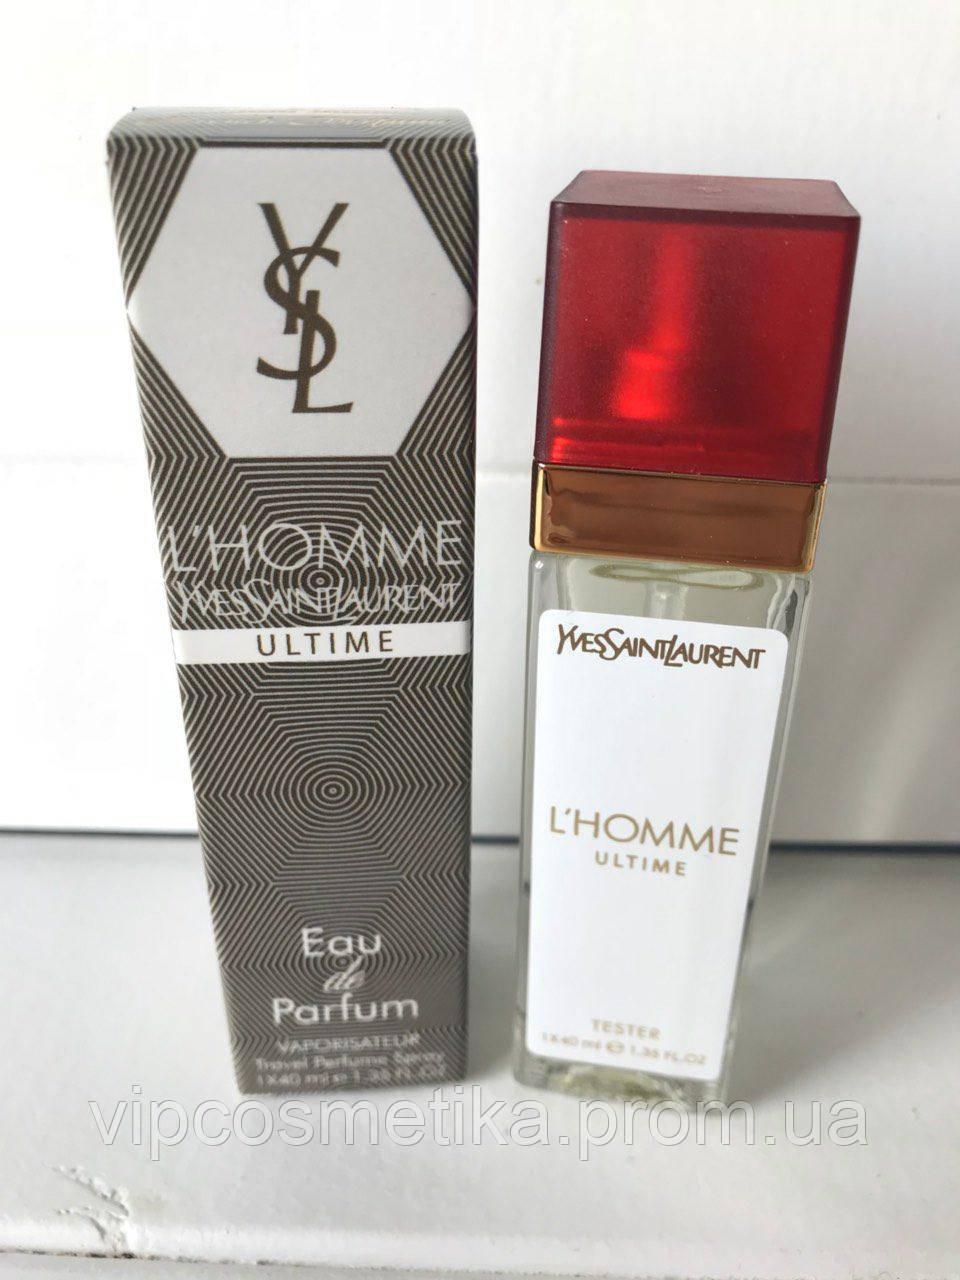 Yves Saint Laurent L'Homme Ultime 40мл